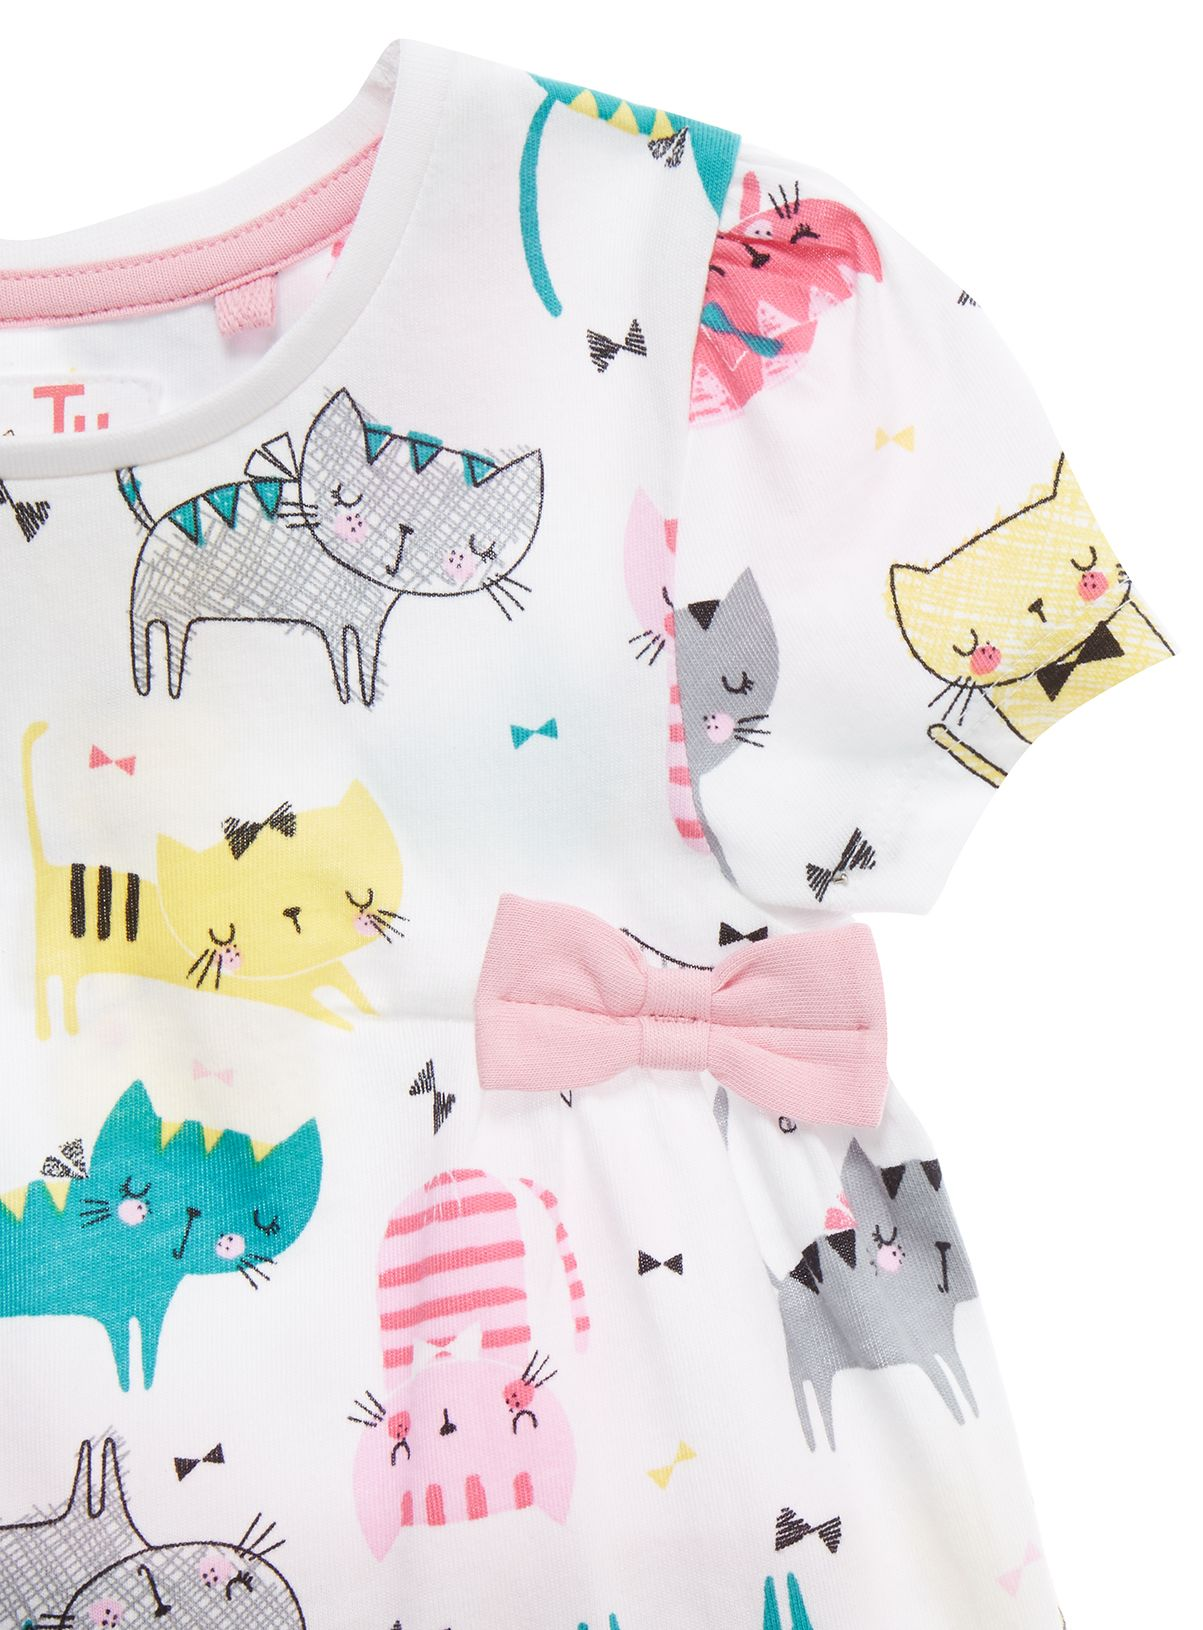 Seasonal Wardrobe: Update Her Seasonal Wardrobe With This Cat Print Set